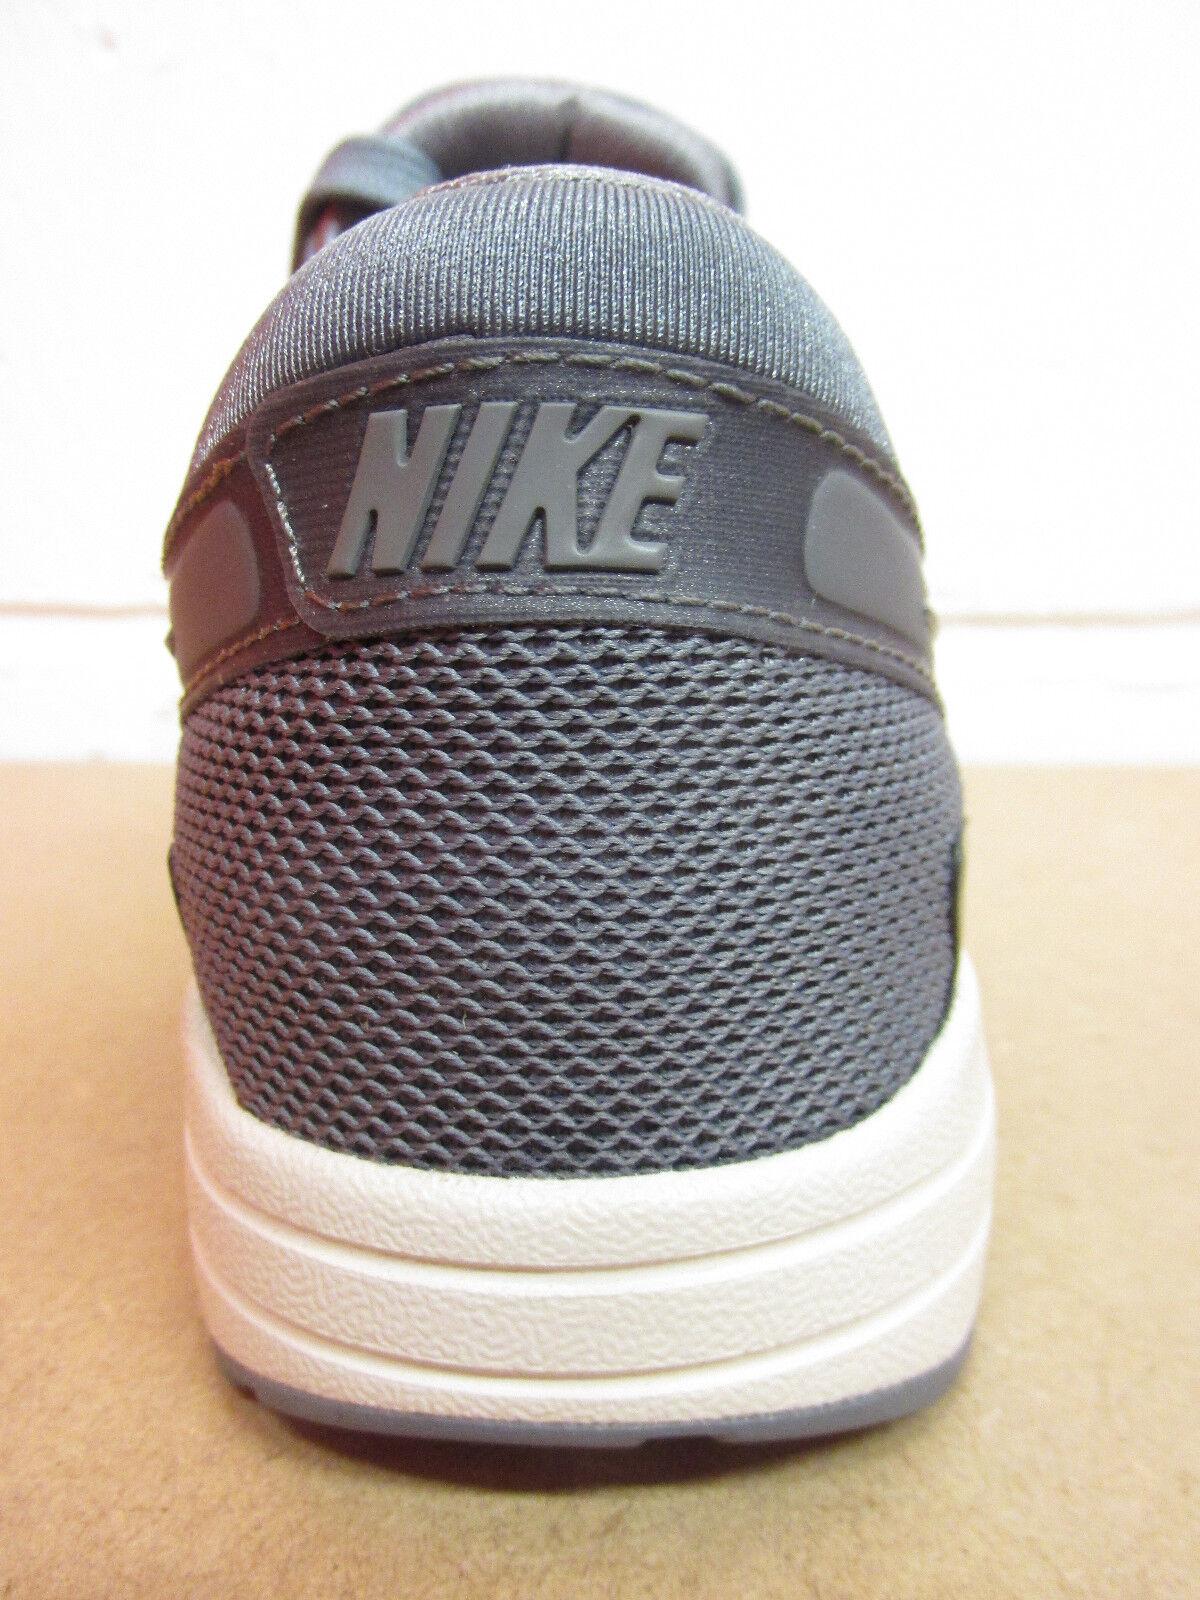 Nike Donna Air Max Zero Scarpe da da Corsa 857661 001 Scarpe da da Tennis cfc6fb